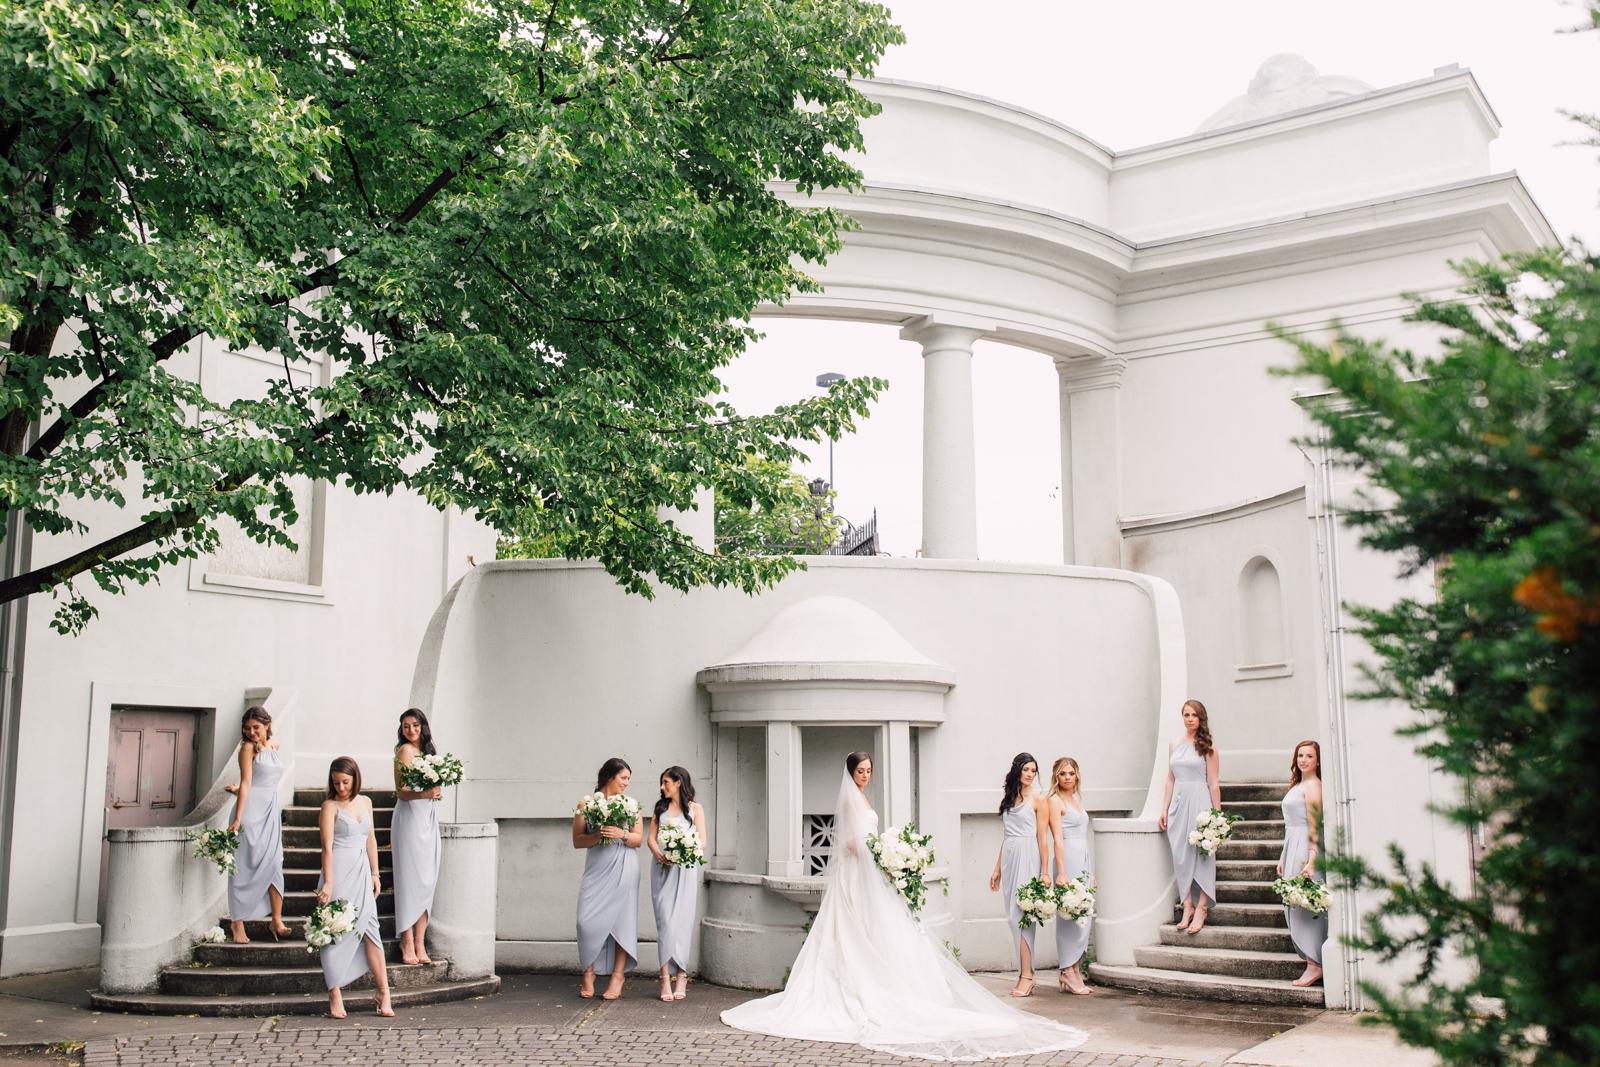 sunnyside pavilion bridesmaids